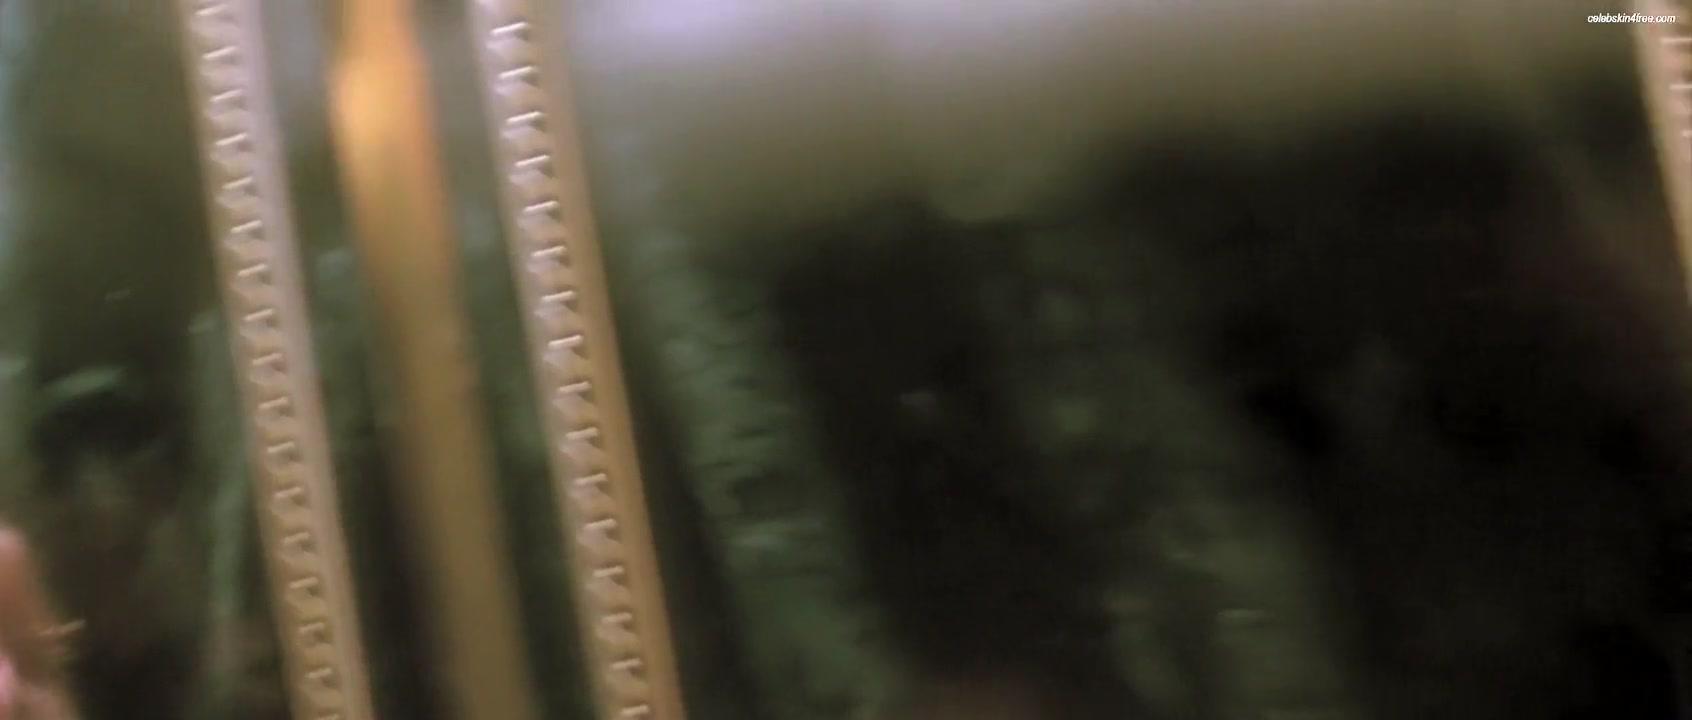 Hot xXx Video Shemale sarina valentina bent over